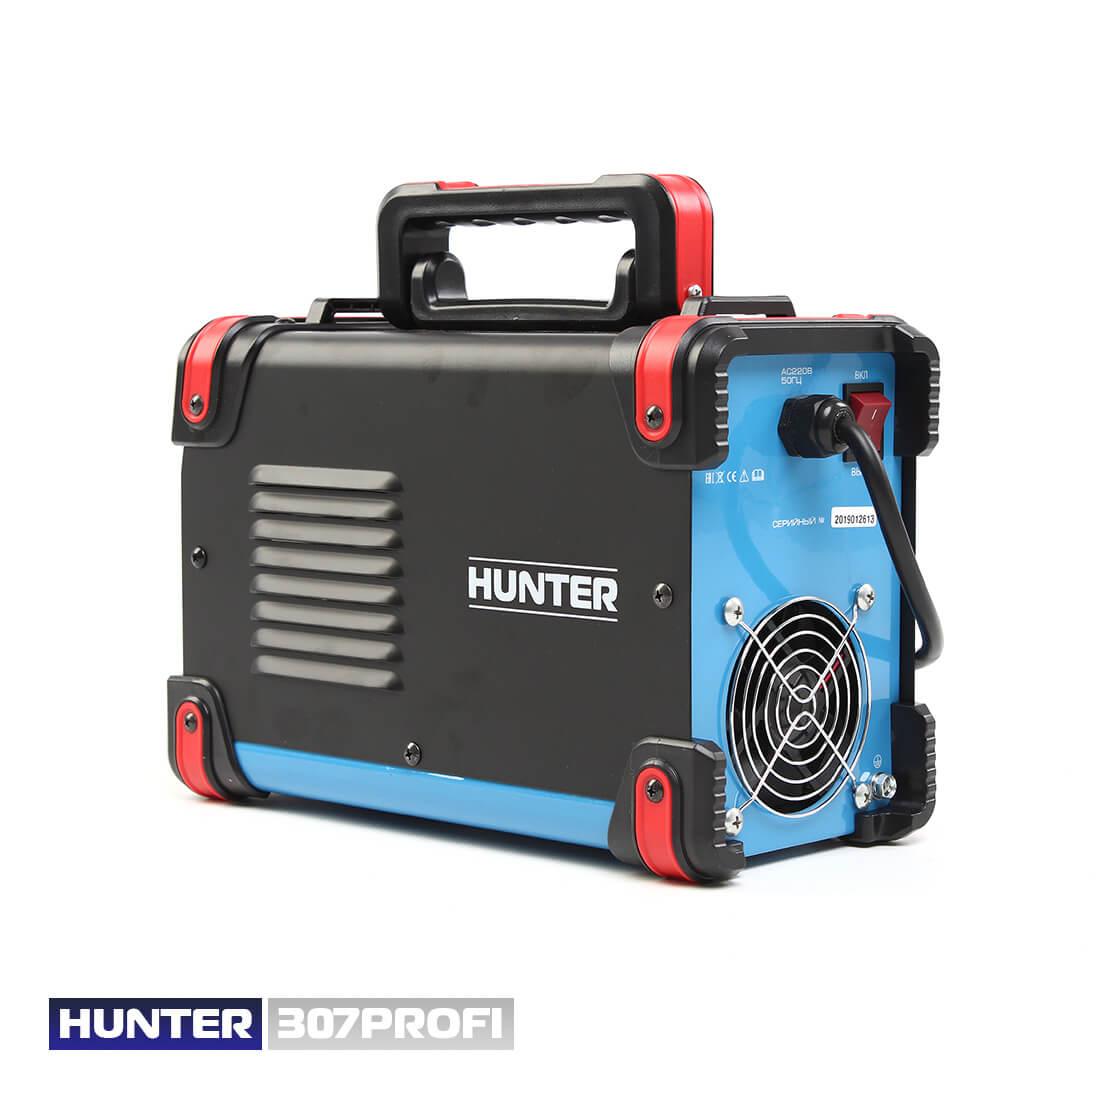 Фото Hunter MMA 307 PROFI (дуговая) цена 3150грн №6 — Hunter